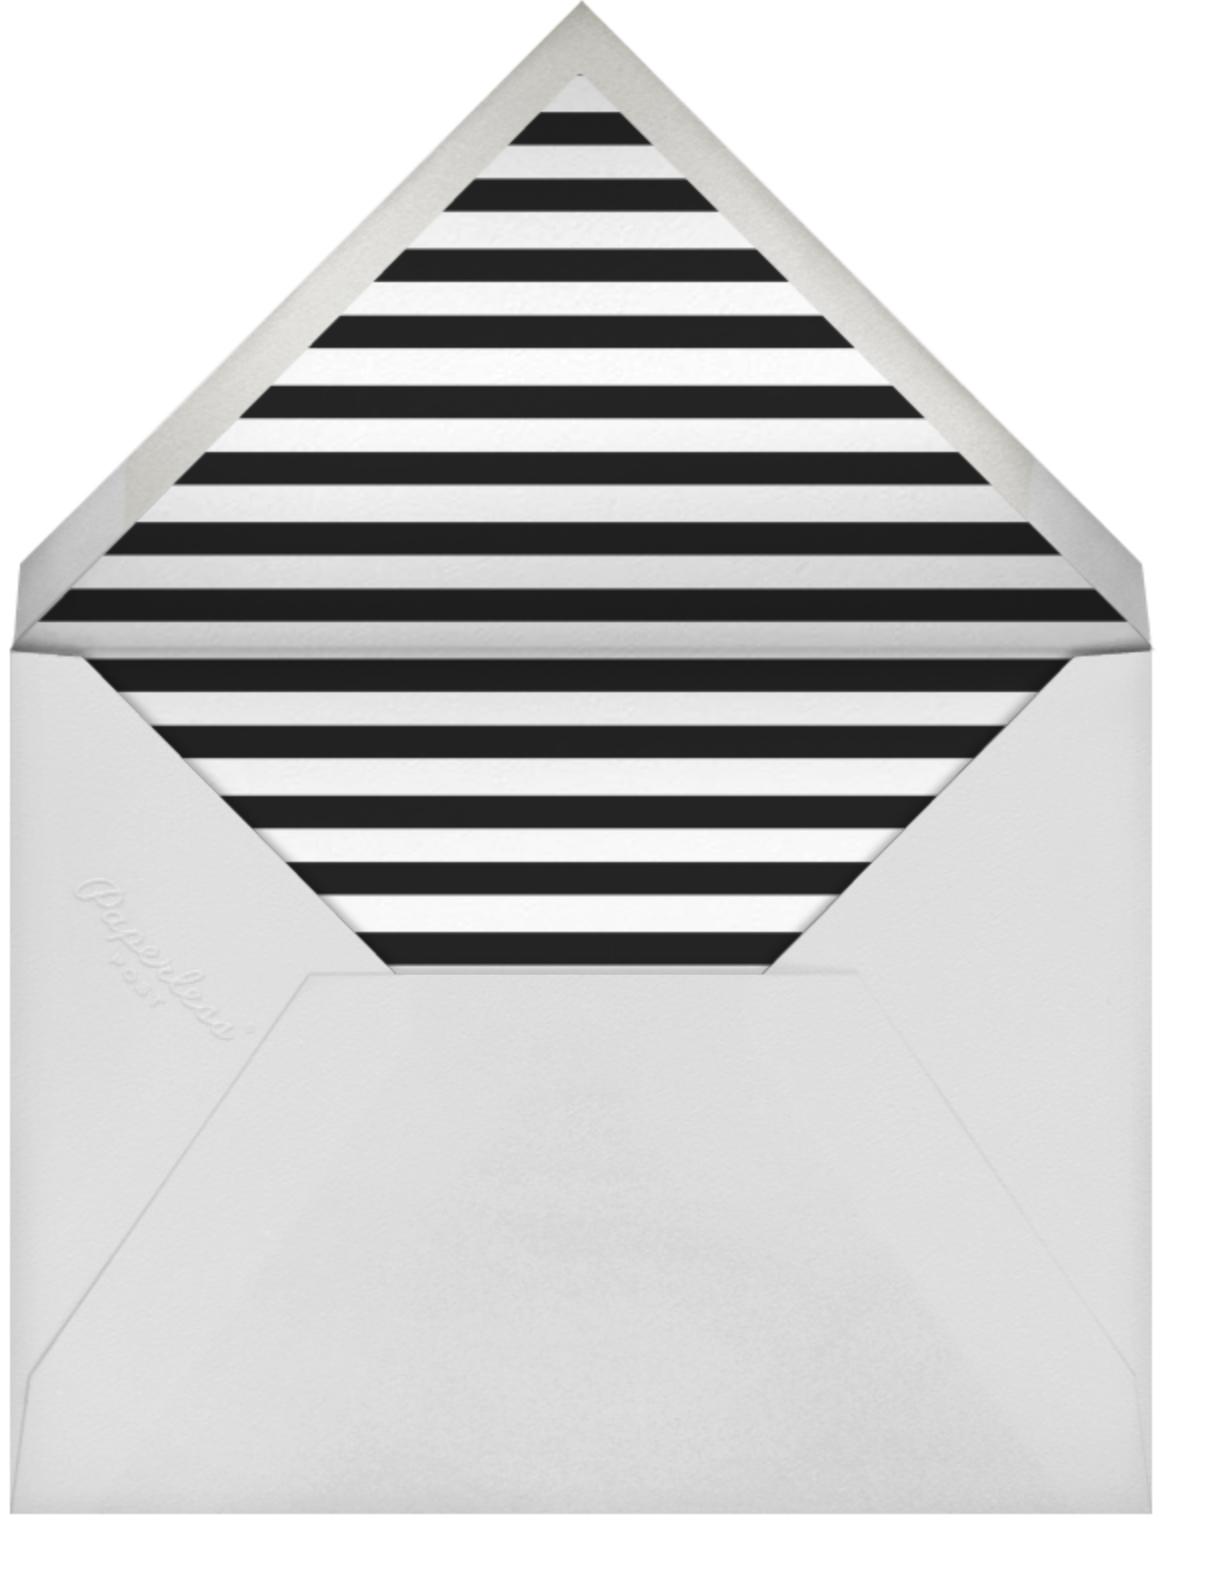 Confetti - Black/Gold - kate spade new york - Cocktail party - envelope back